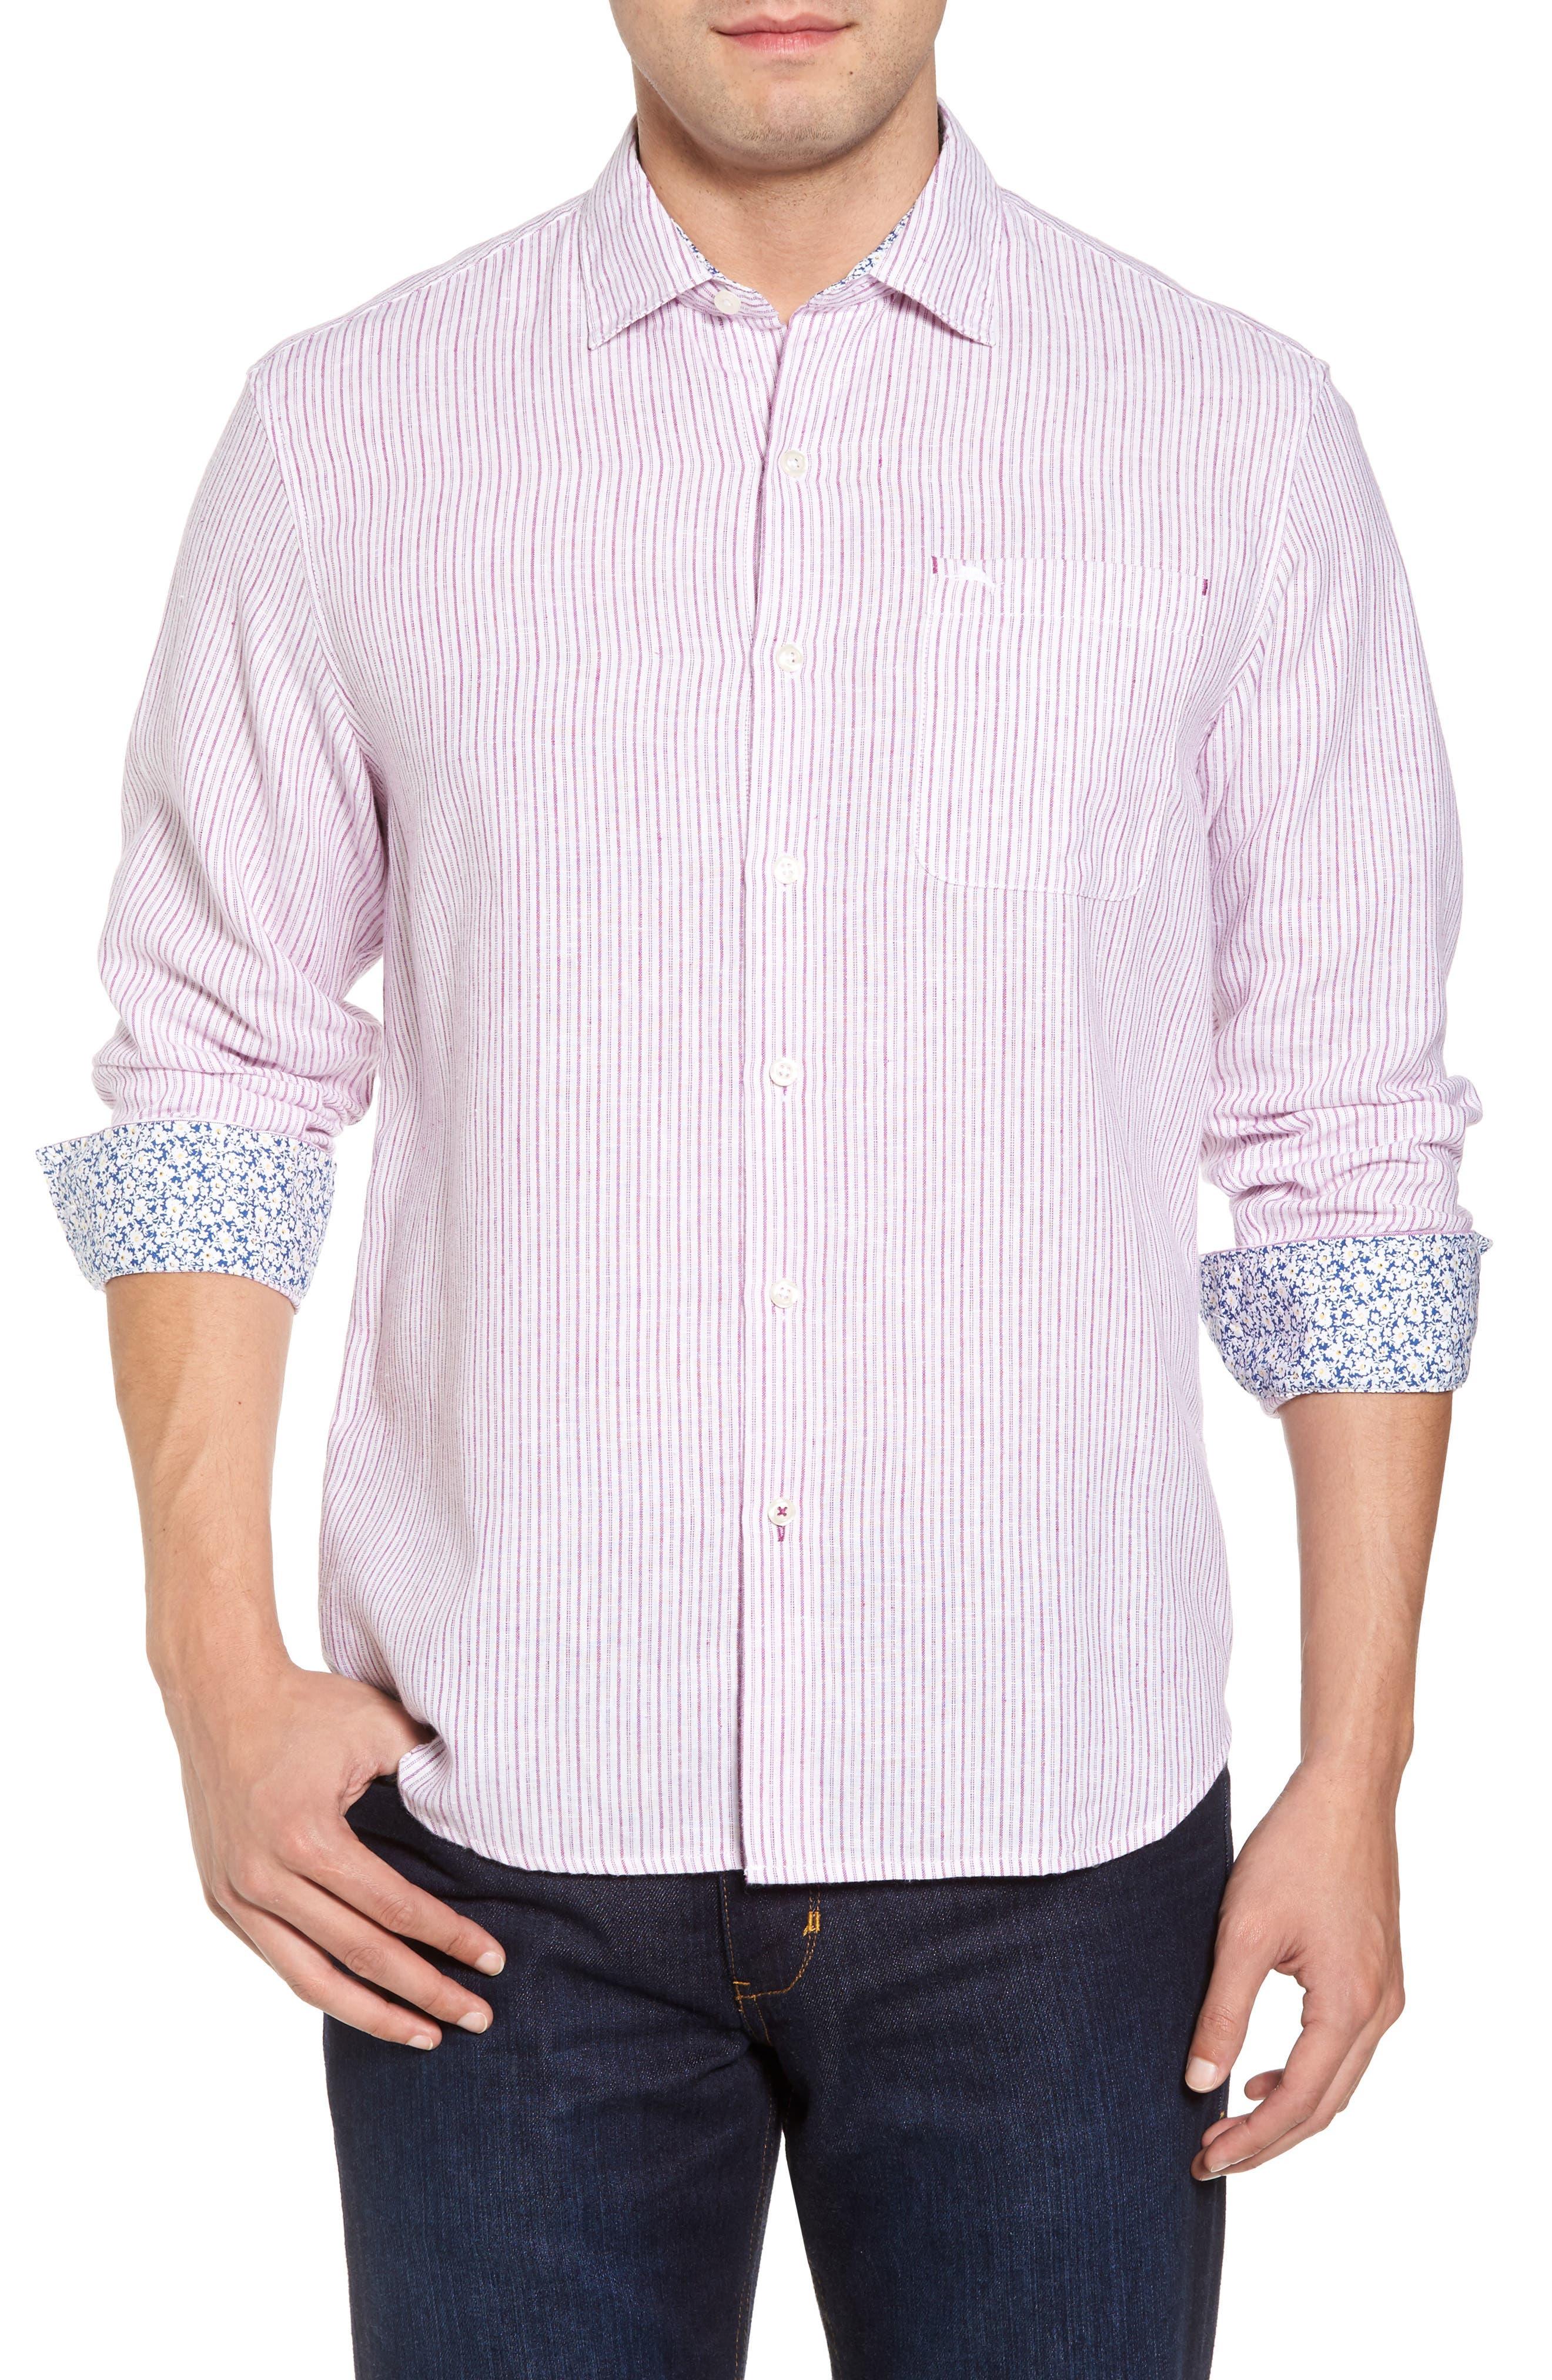 Main Image - Tommy Bahama Bungalow Stripe Regular Fit Linen Blend Sport Shirt